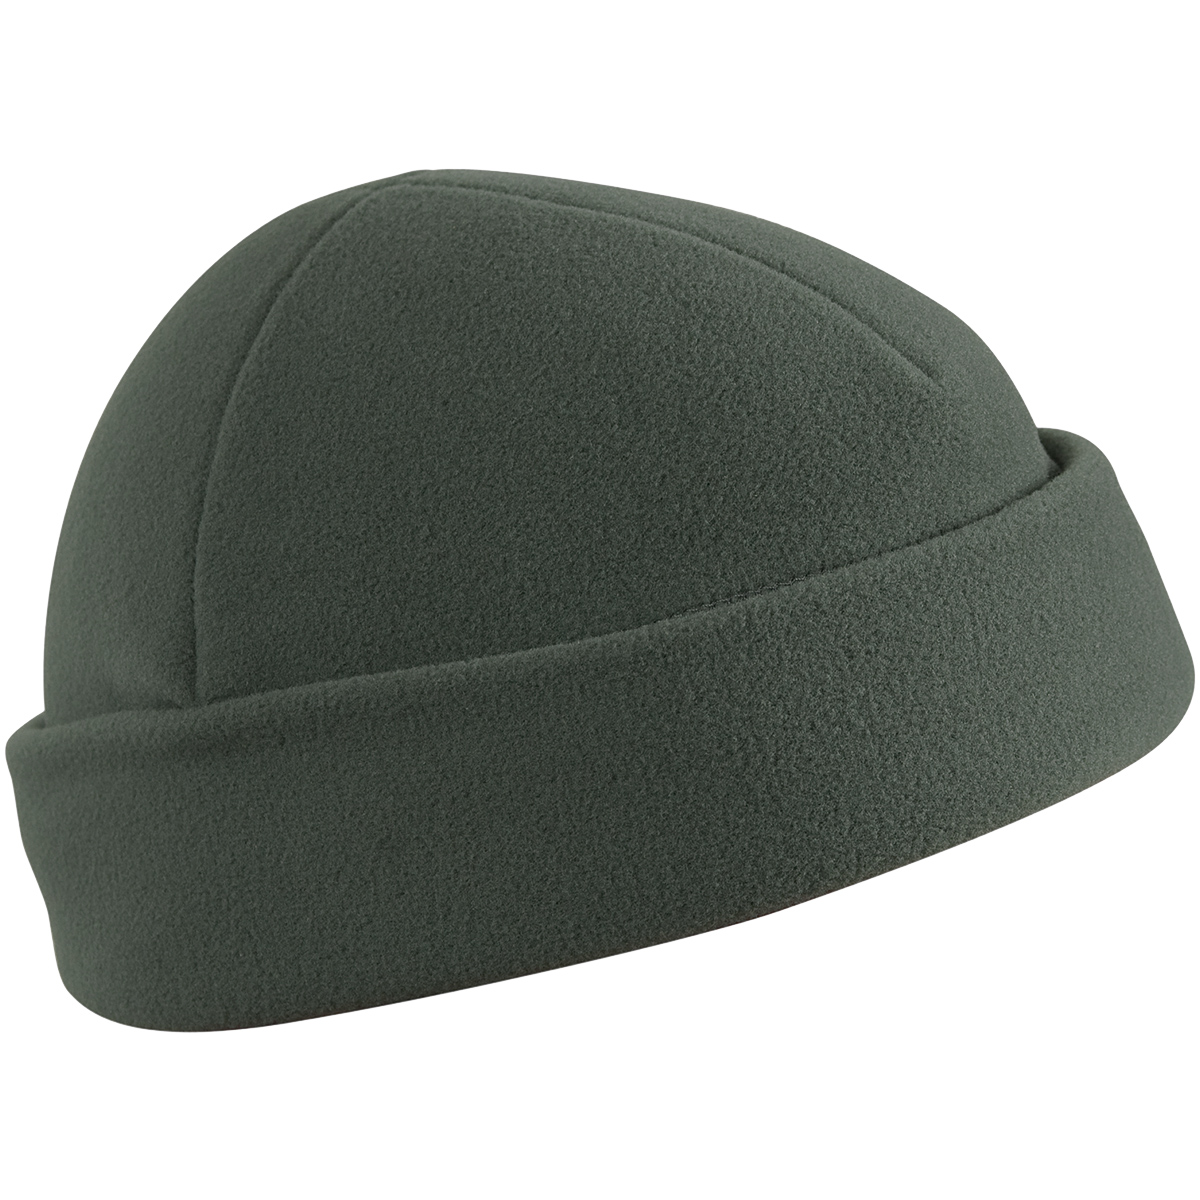 Helikon bonnet Foliage